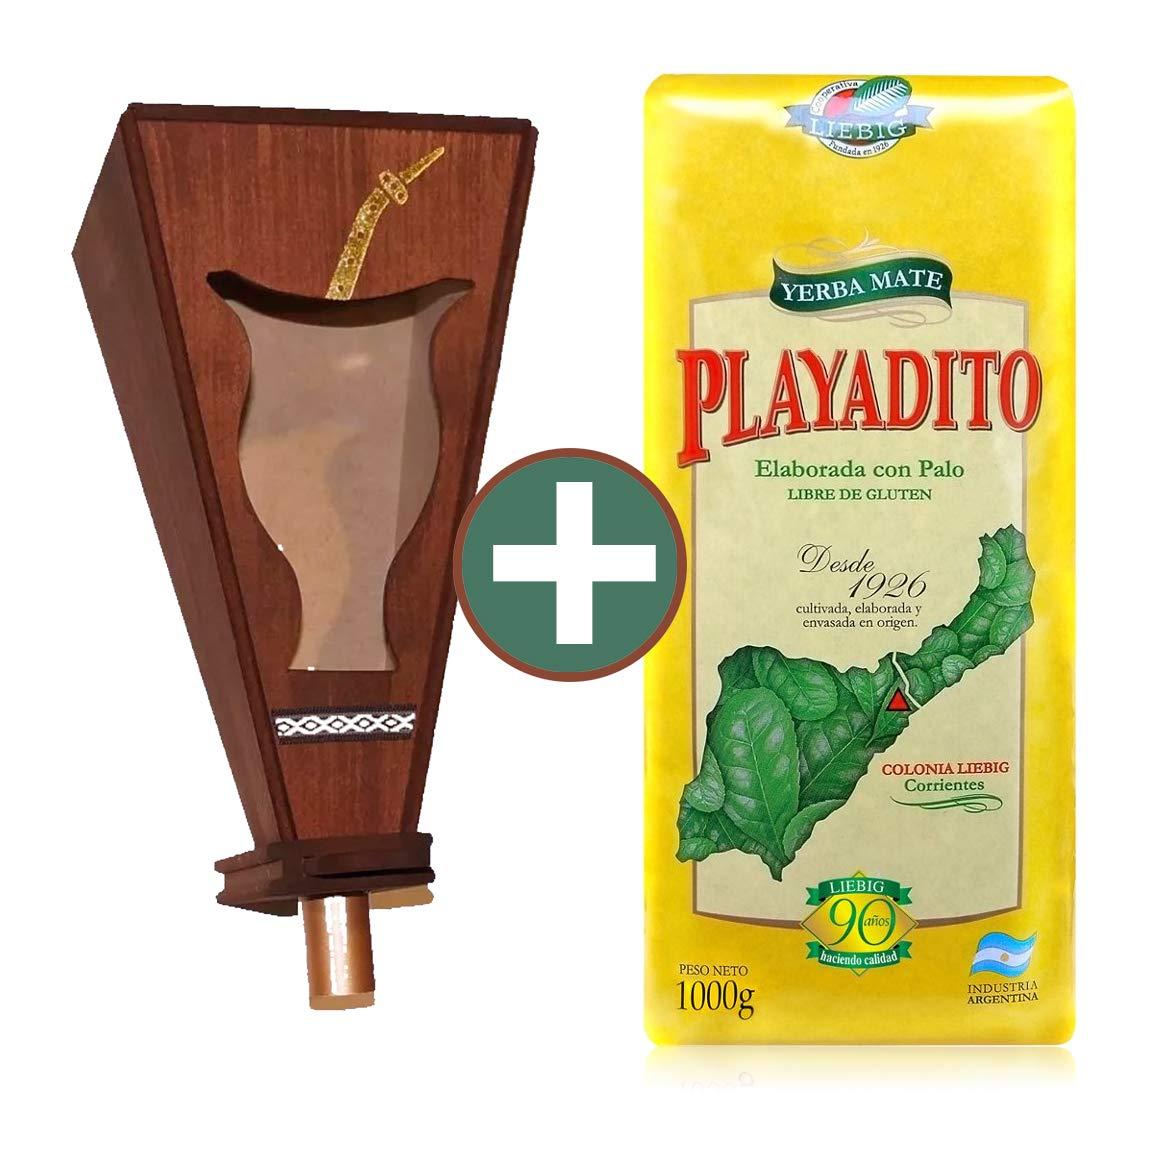 Kit Playadito x 2.2 Lbs Yerba Mate + Wood Dispenser for yerba